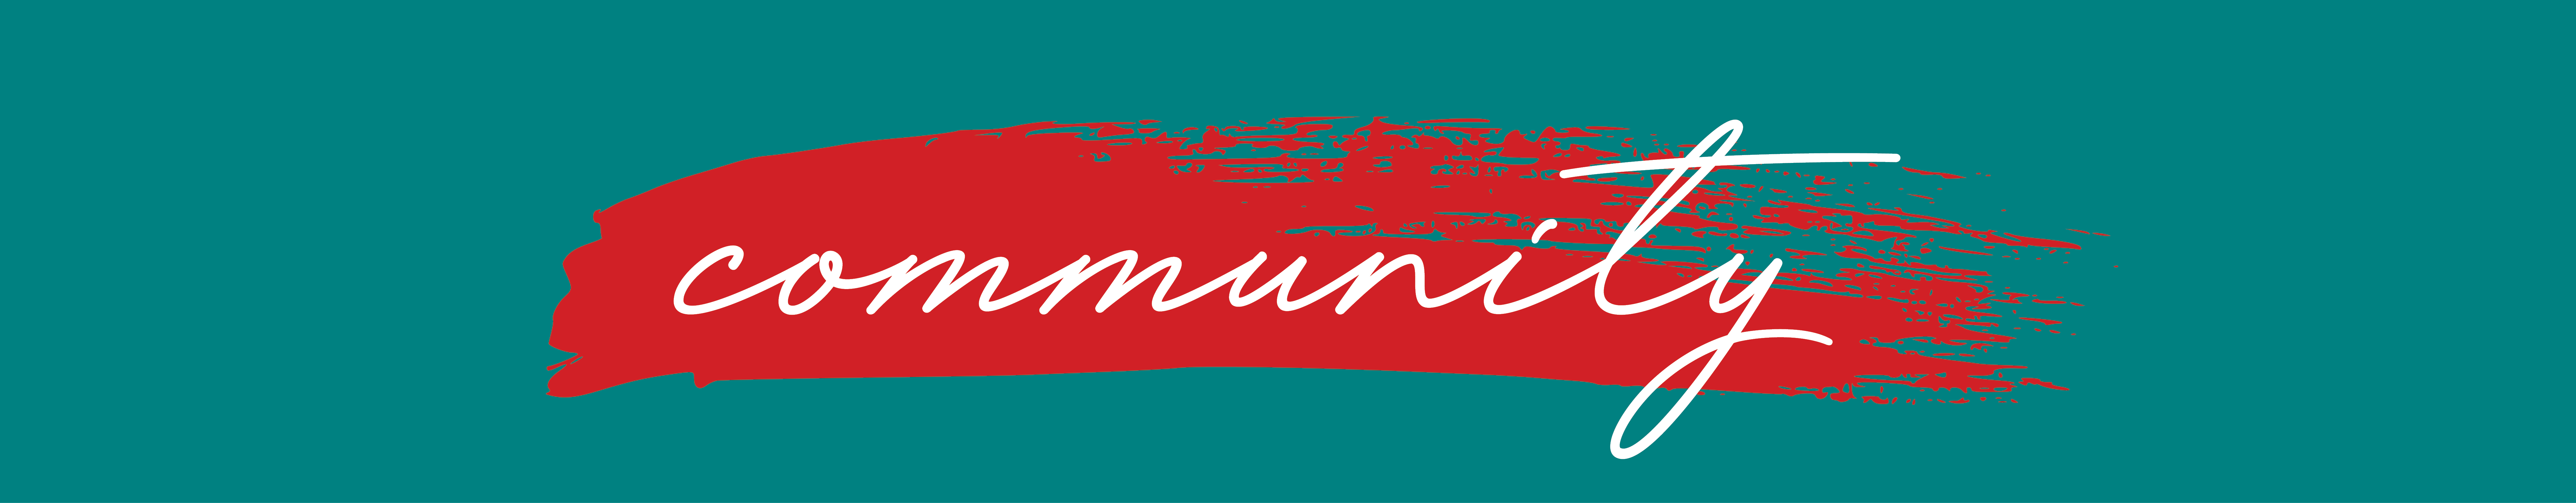 Banner_Community